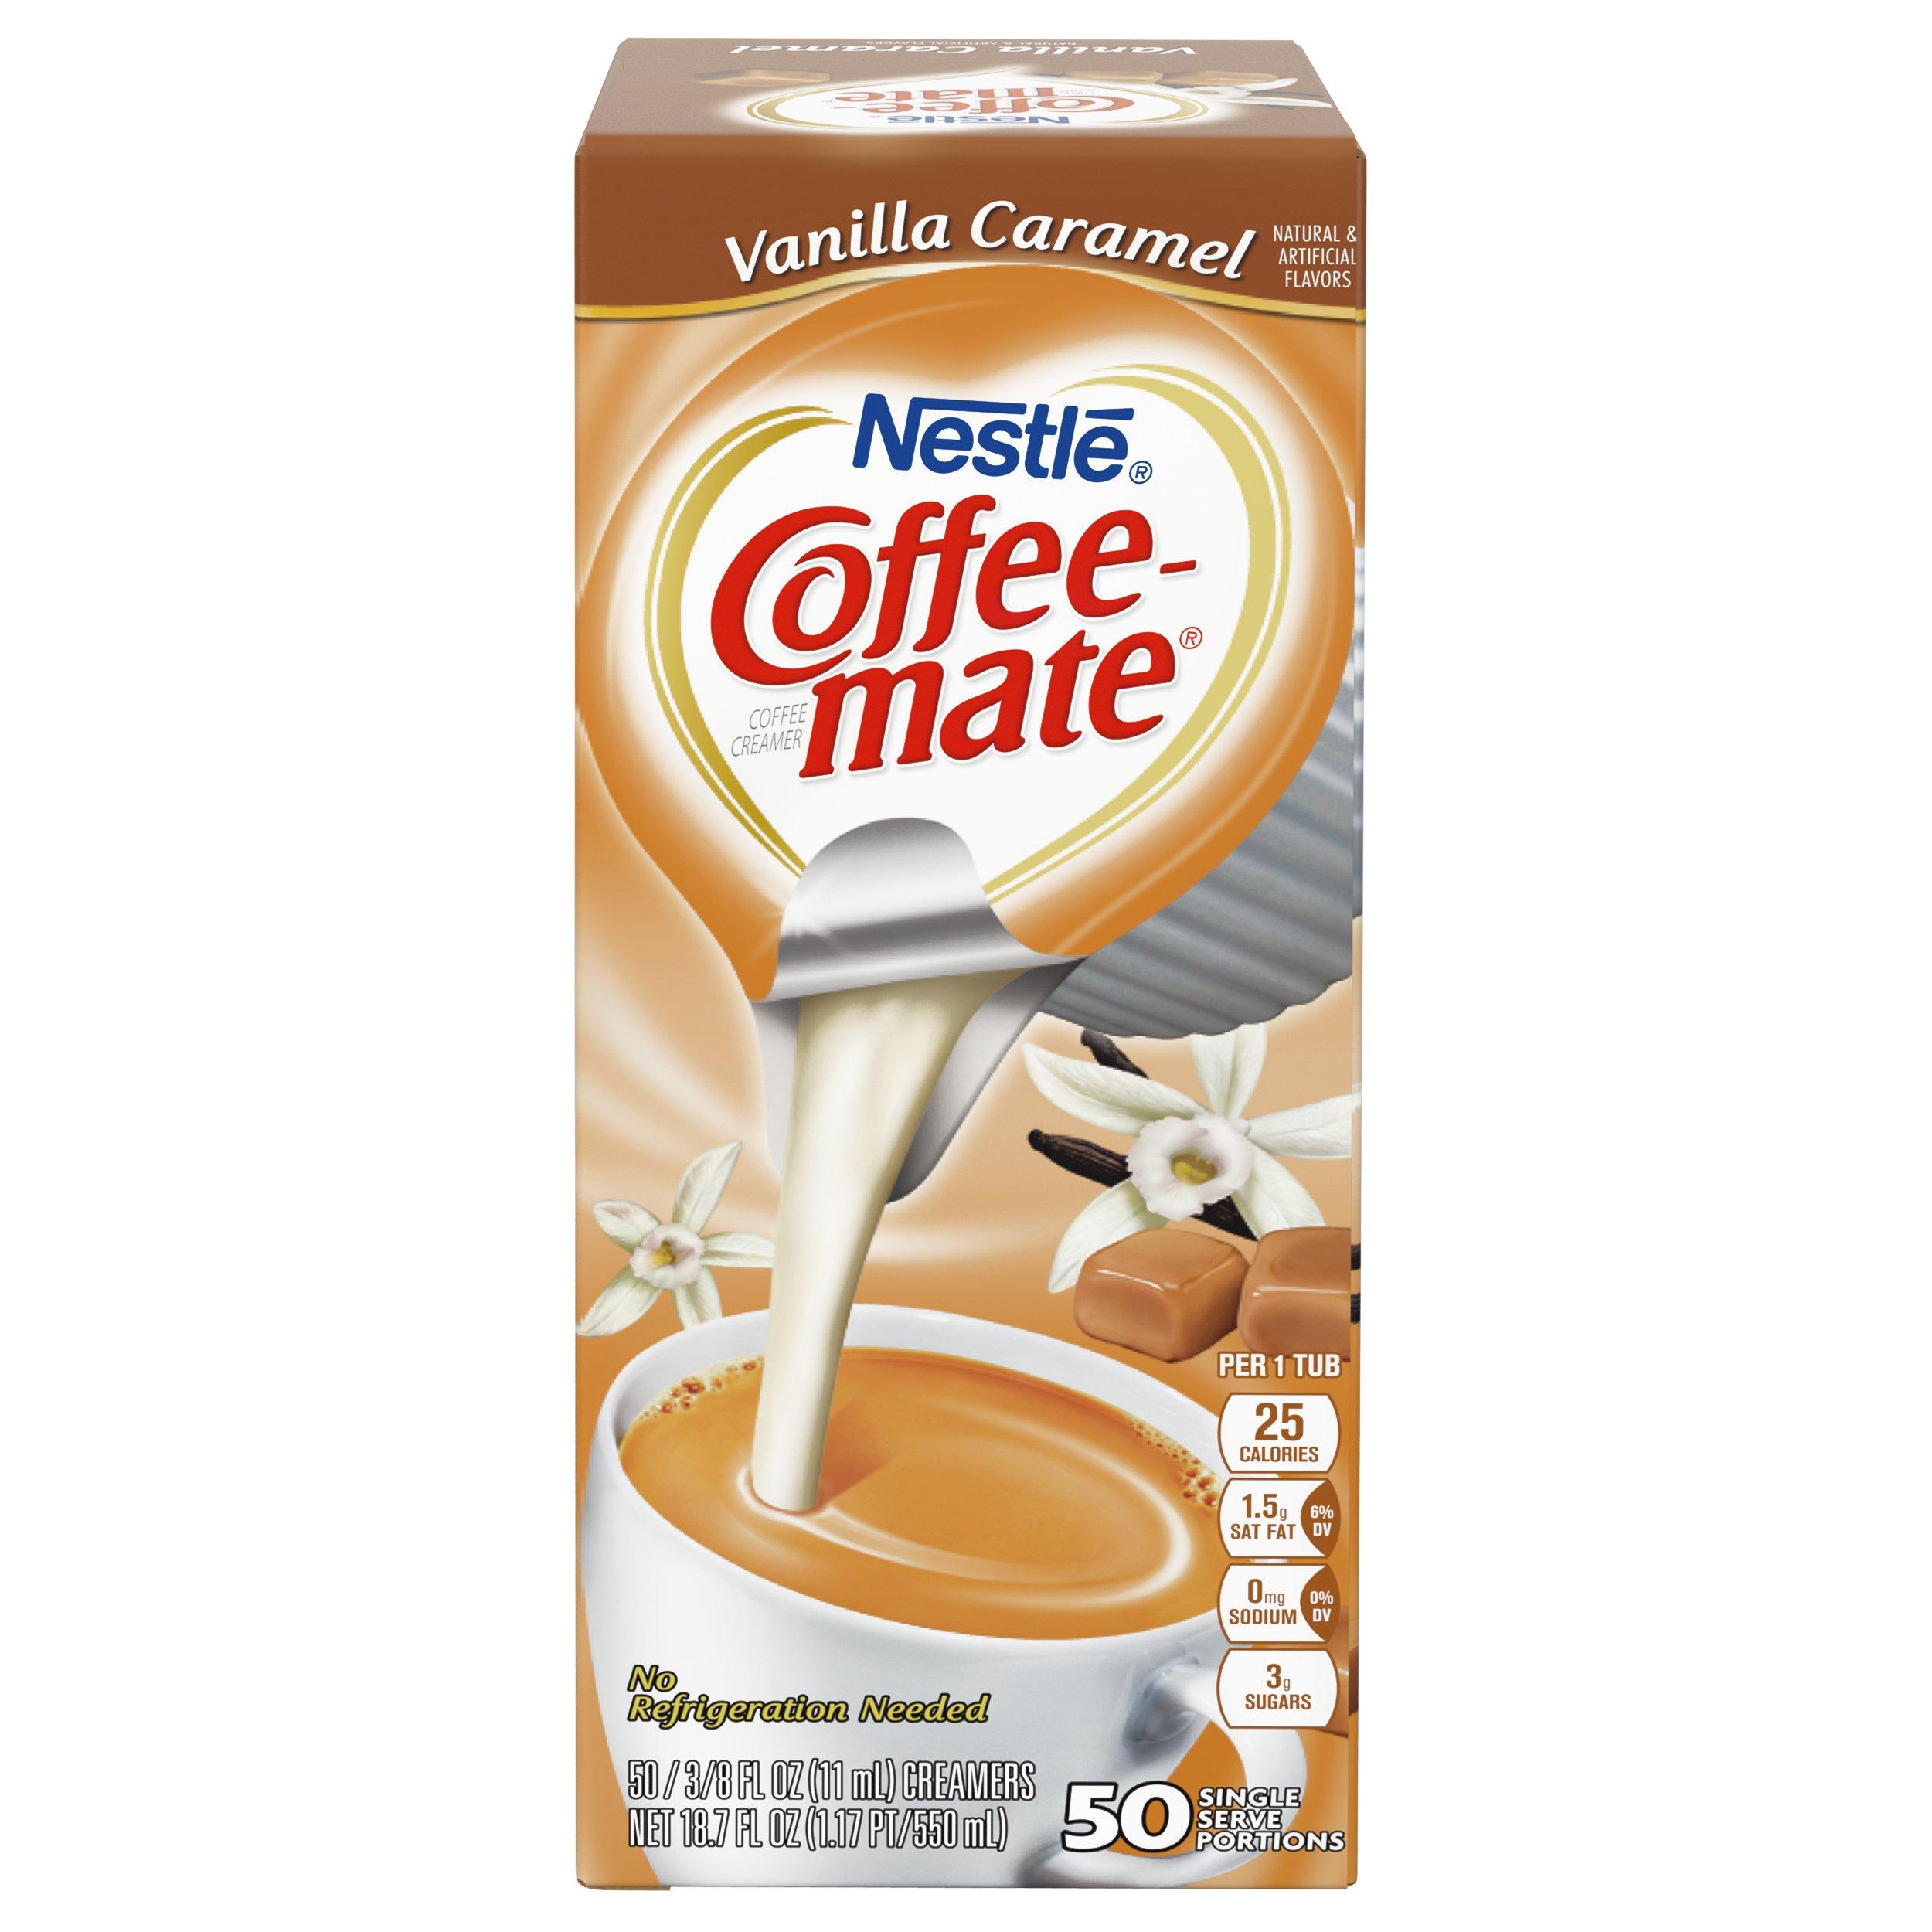 NESTLE COFFEE-MATE Coffee Creamer, Vanilla Caramel, liquid creamer singles, Pack of 50 by Nestle Coffee Mate (Image #4)